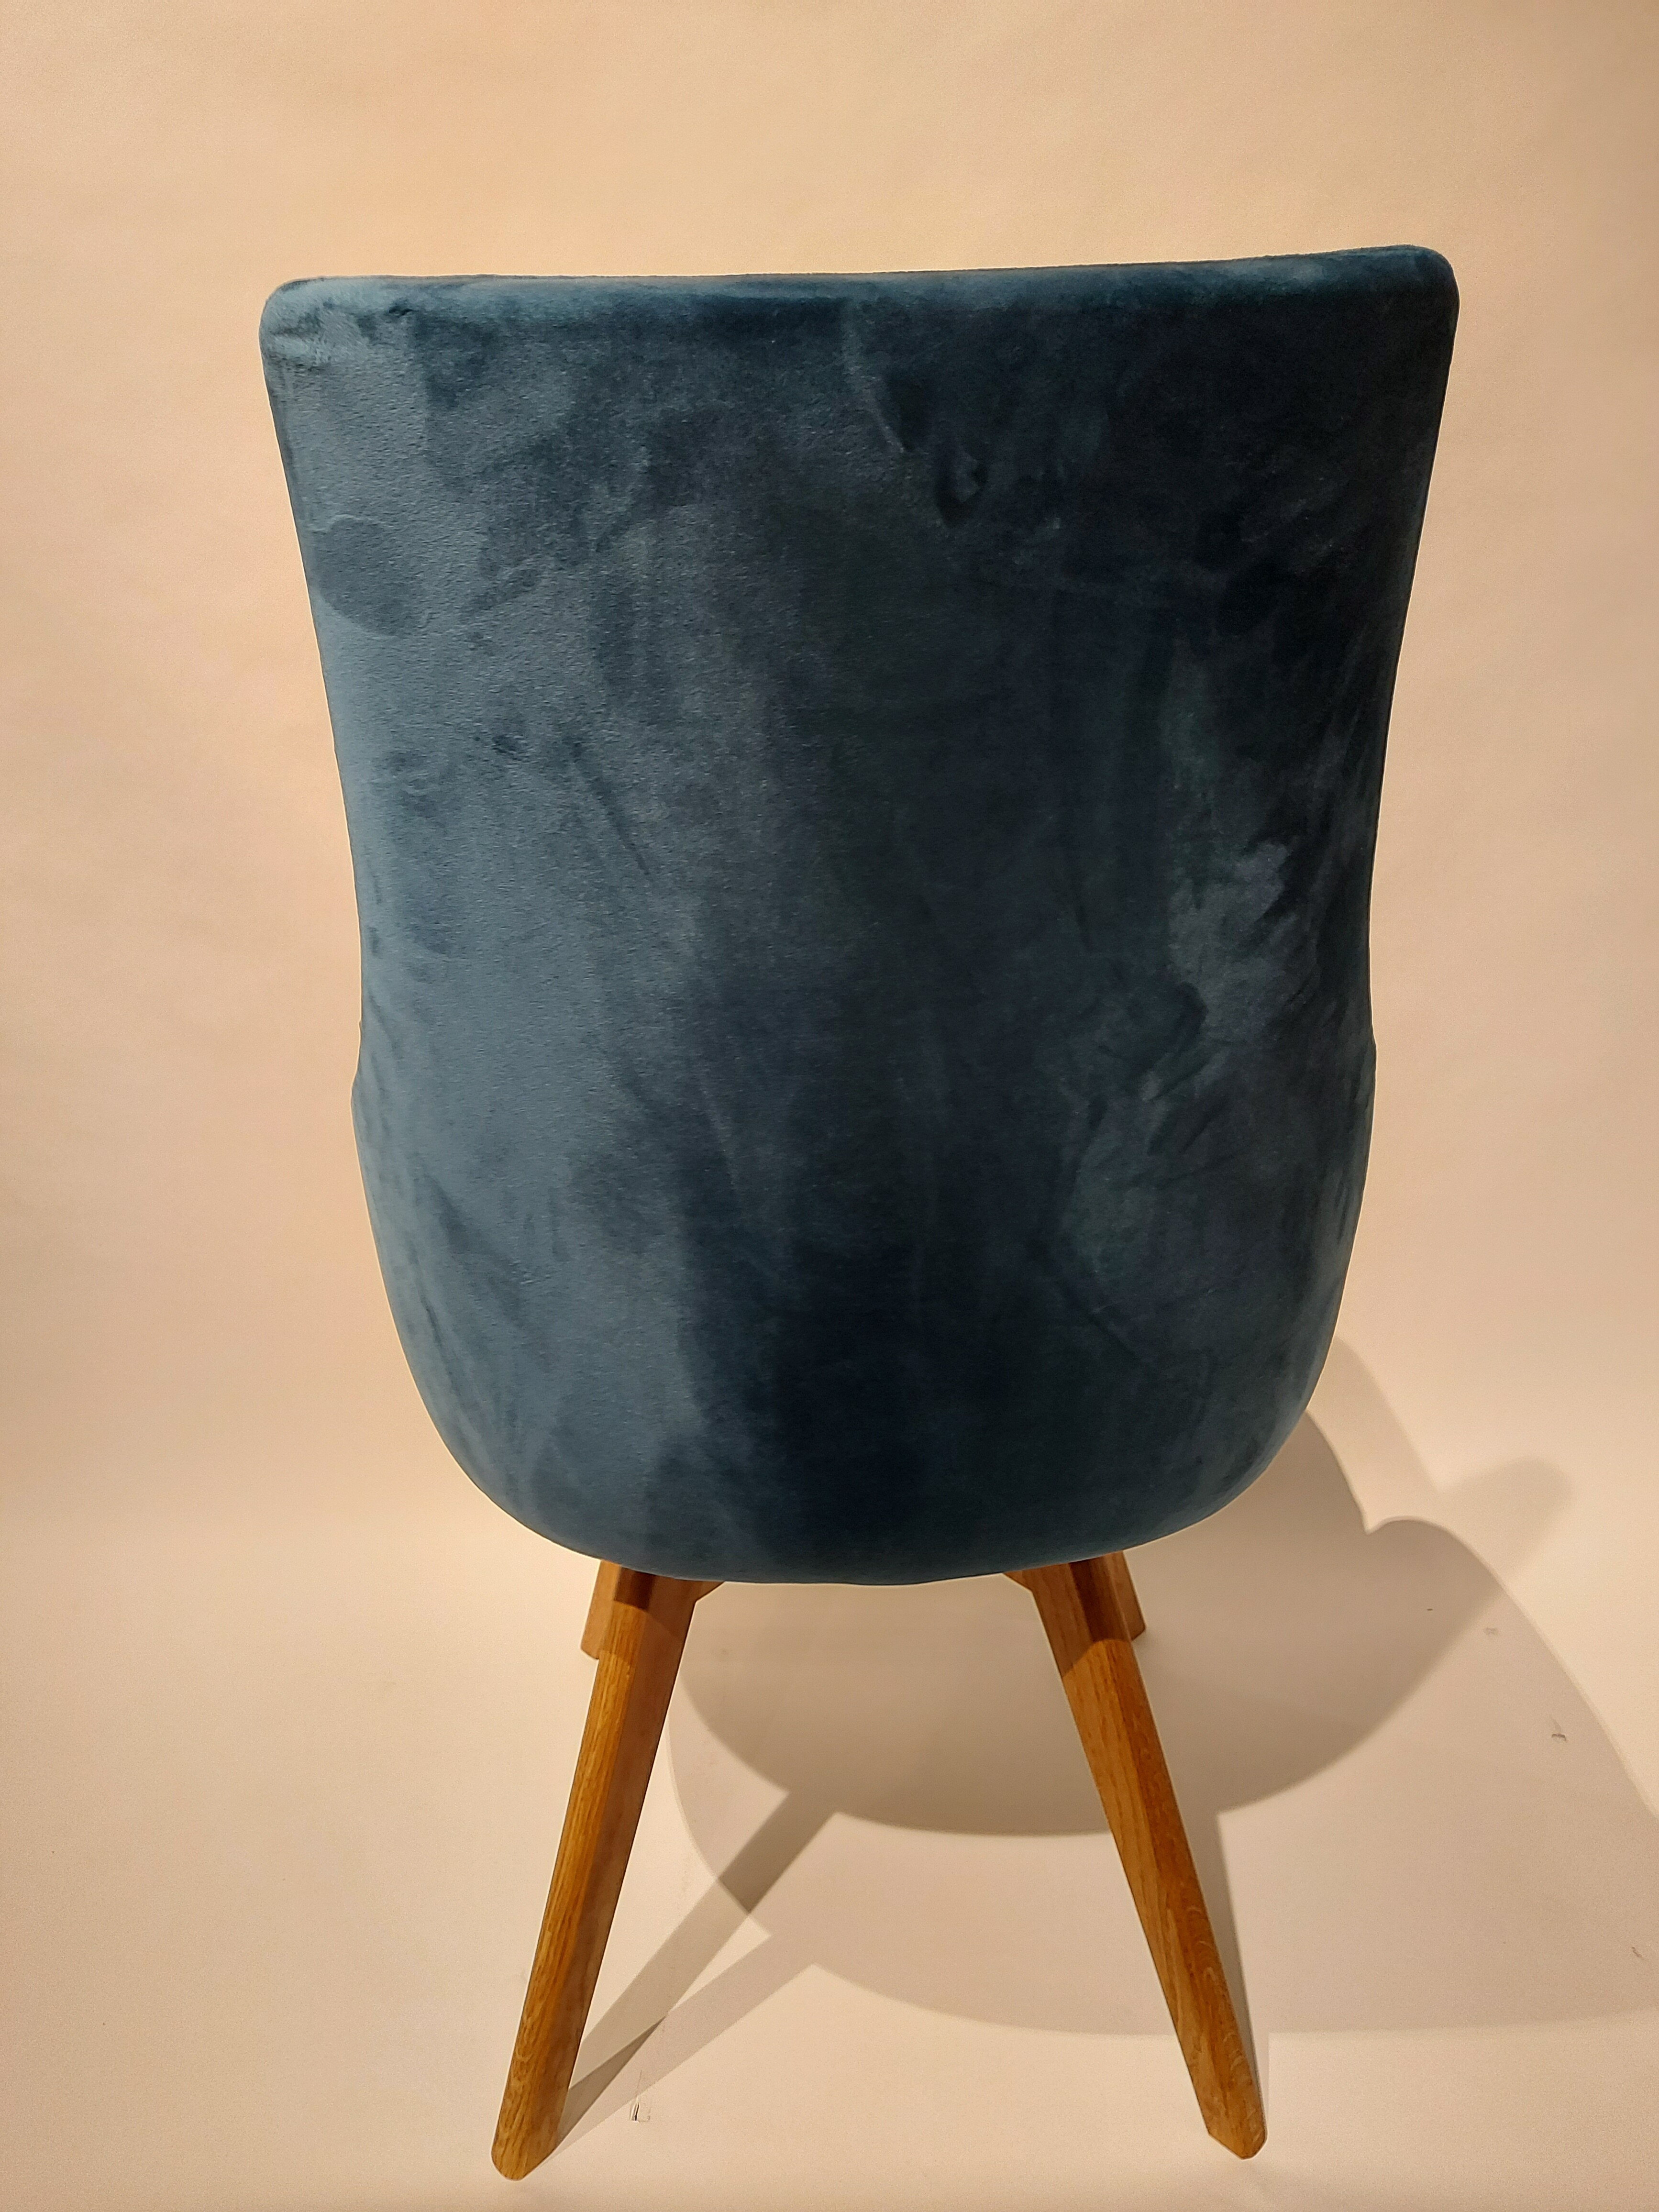 6 Stühle Modell HELLA 03